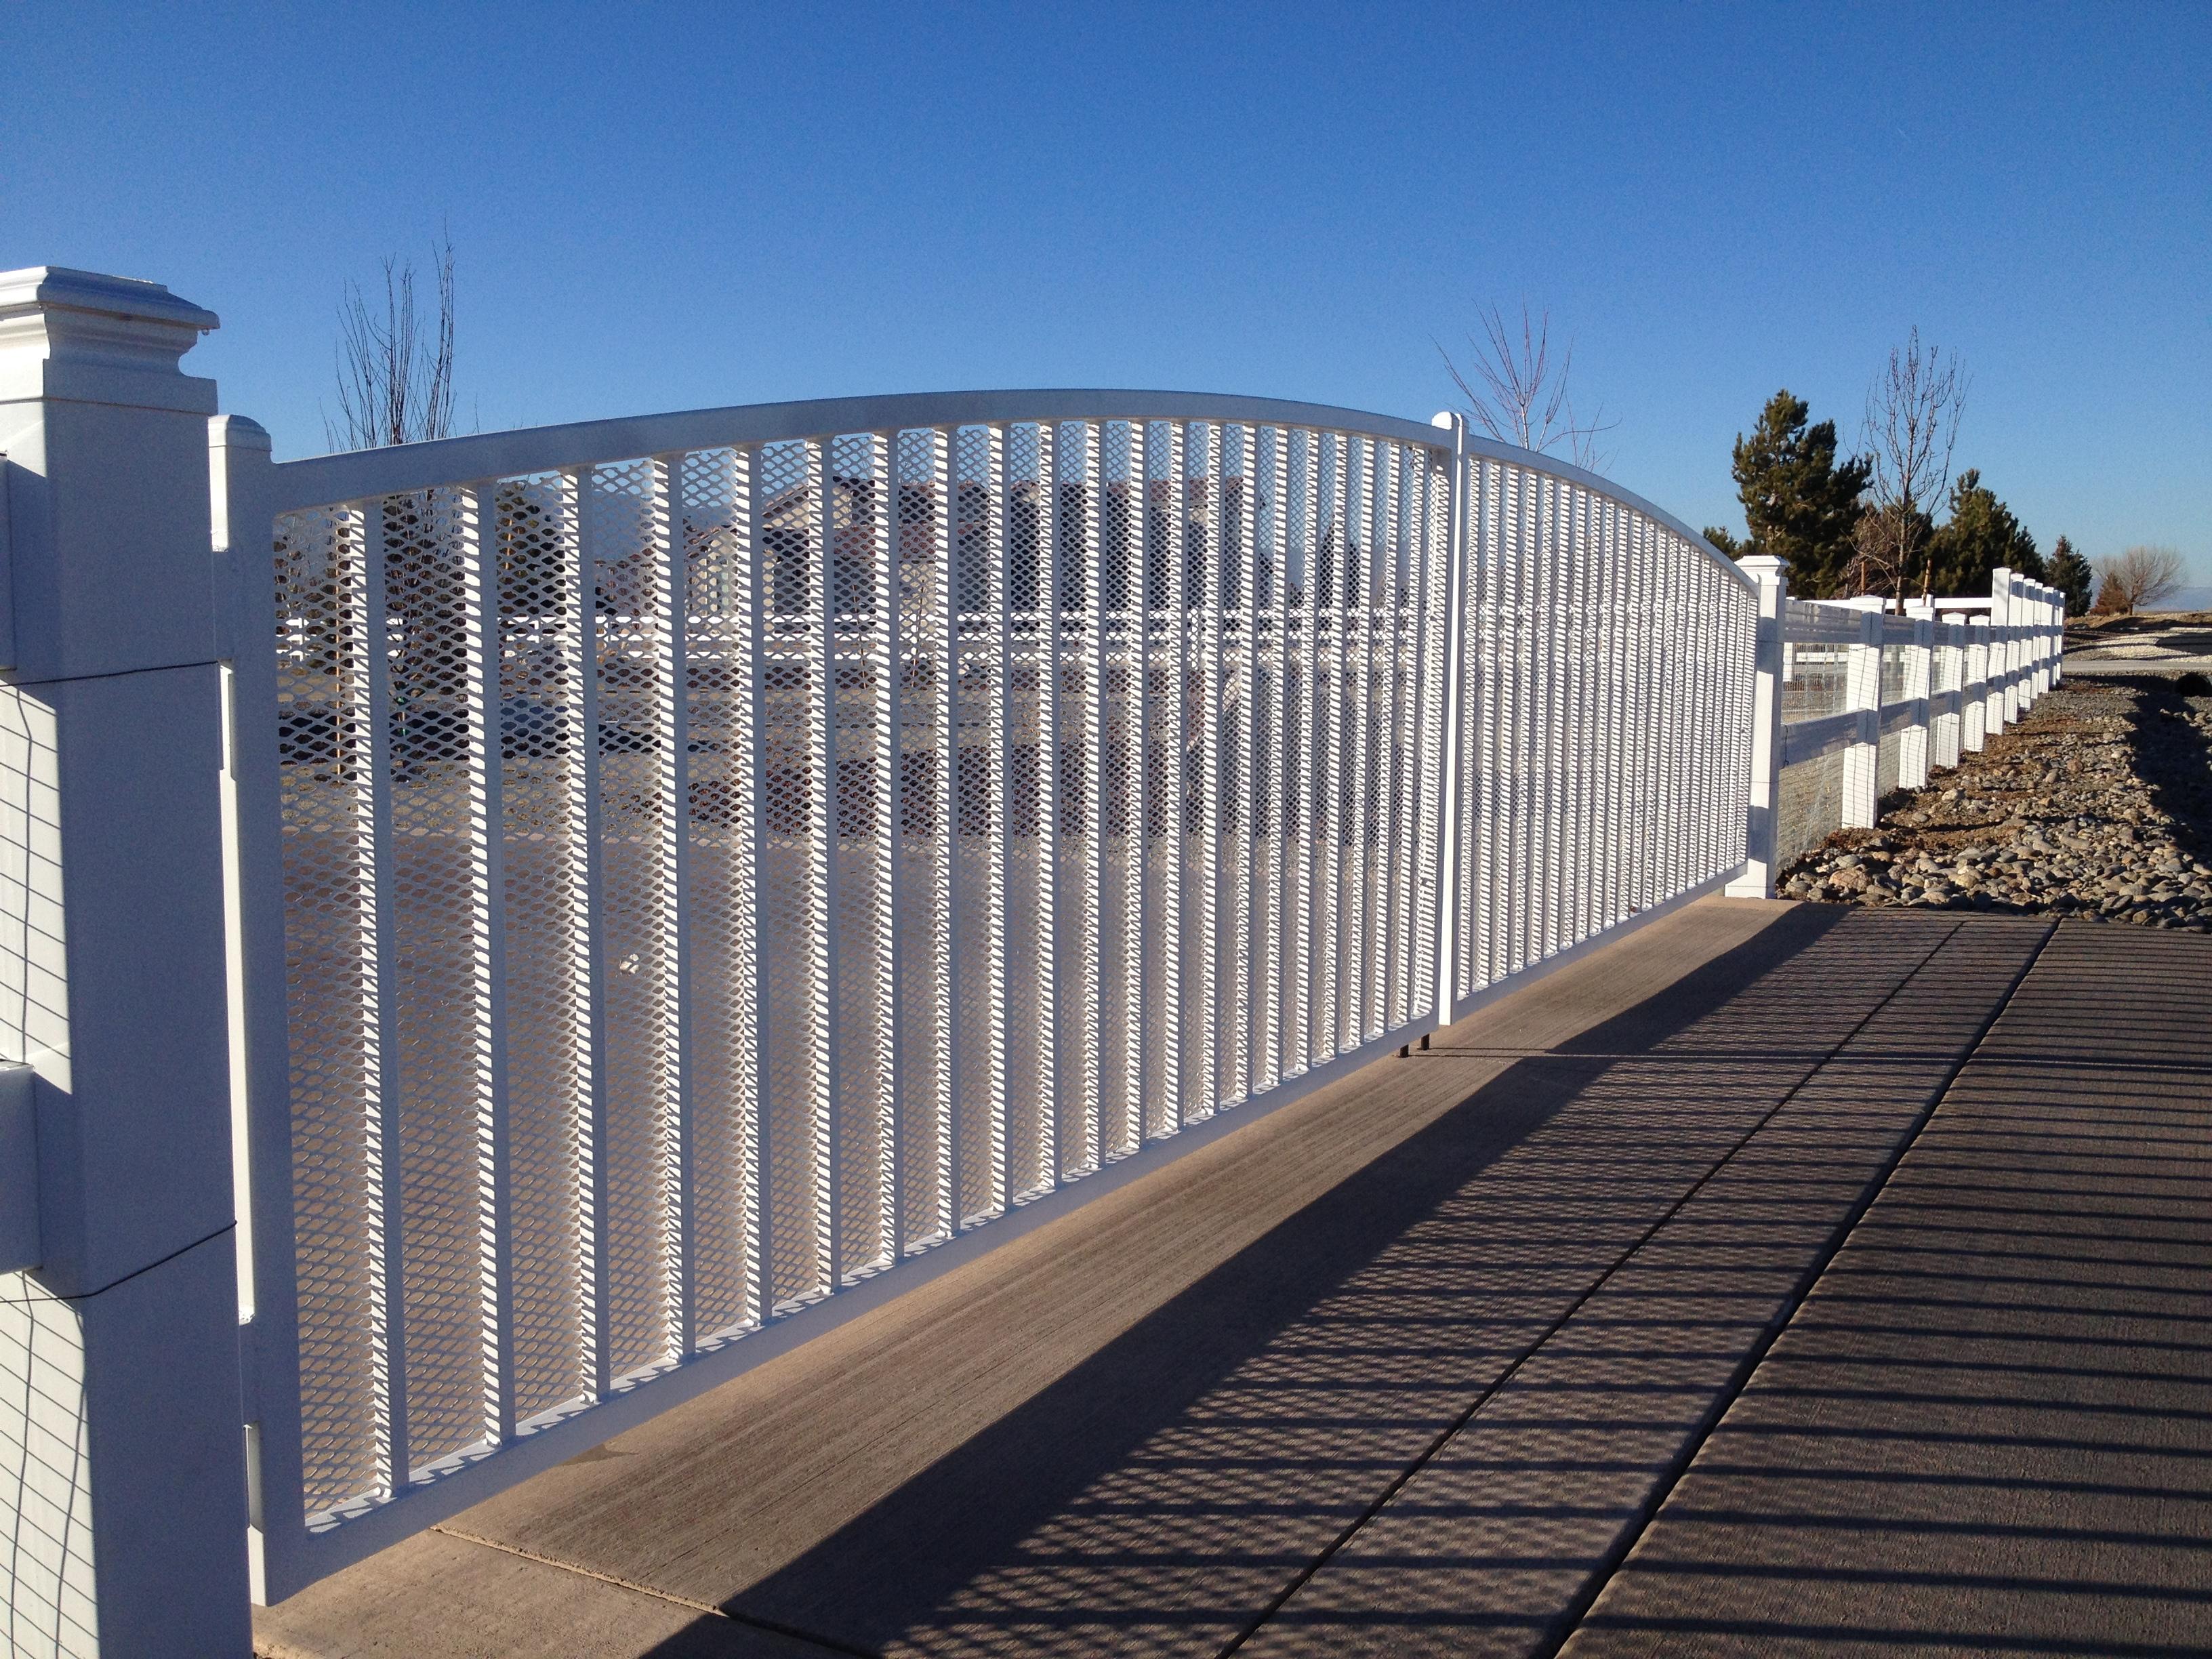 Florence Fence Inc 2597 Nowlin Rd Minden Nv 89423 Yp Com